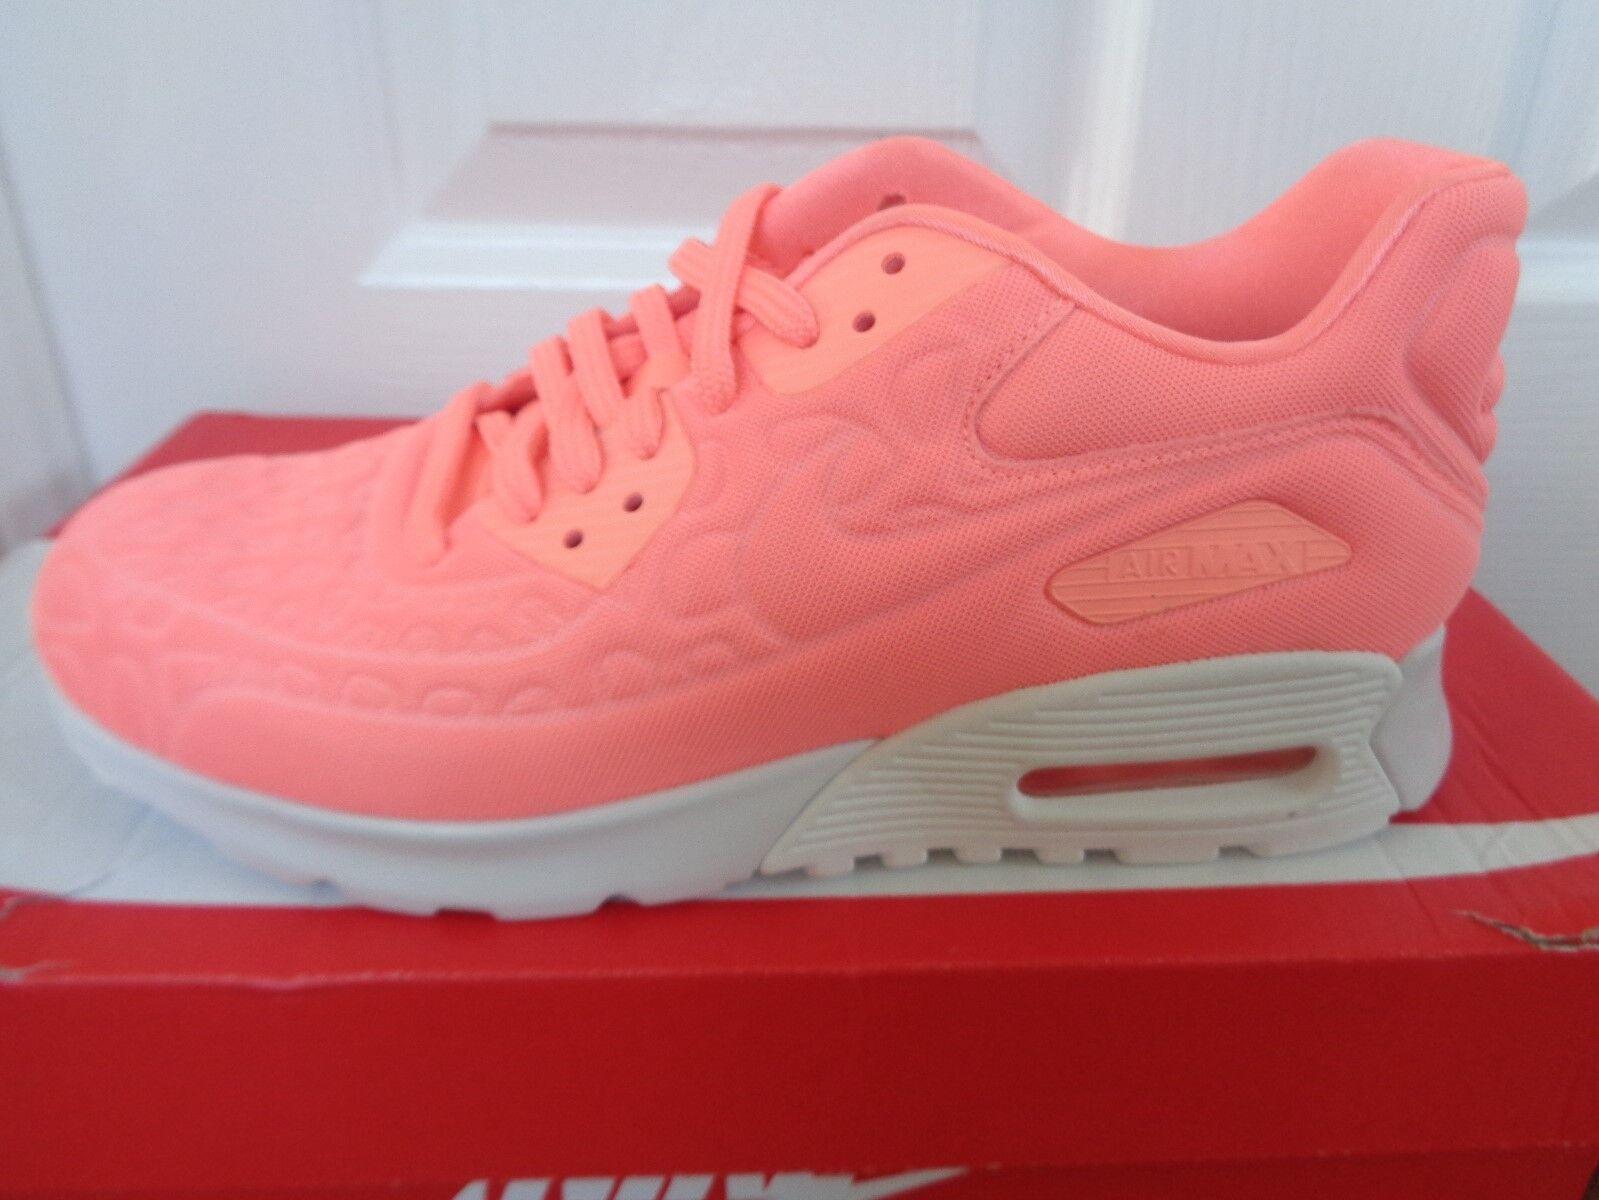 Nike Air Max 90 Ultra Plush wmns trainers 844886 600 eu 38 us 7 NEW+BOX